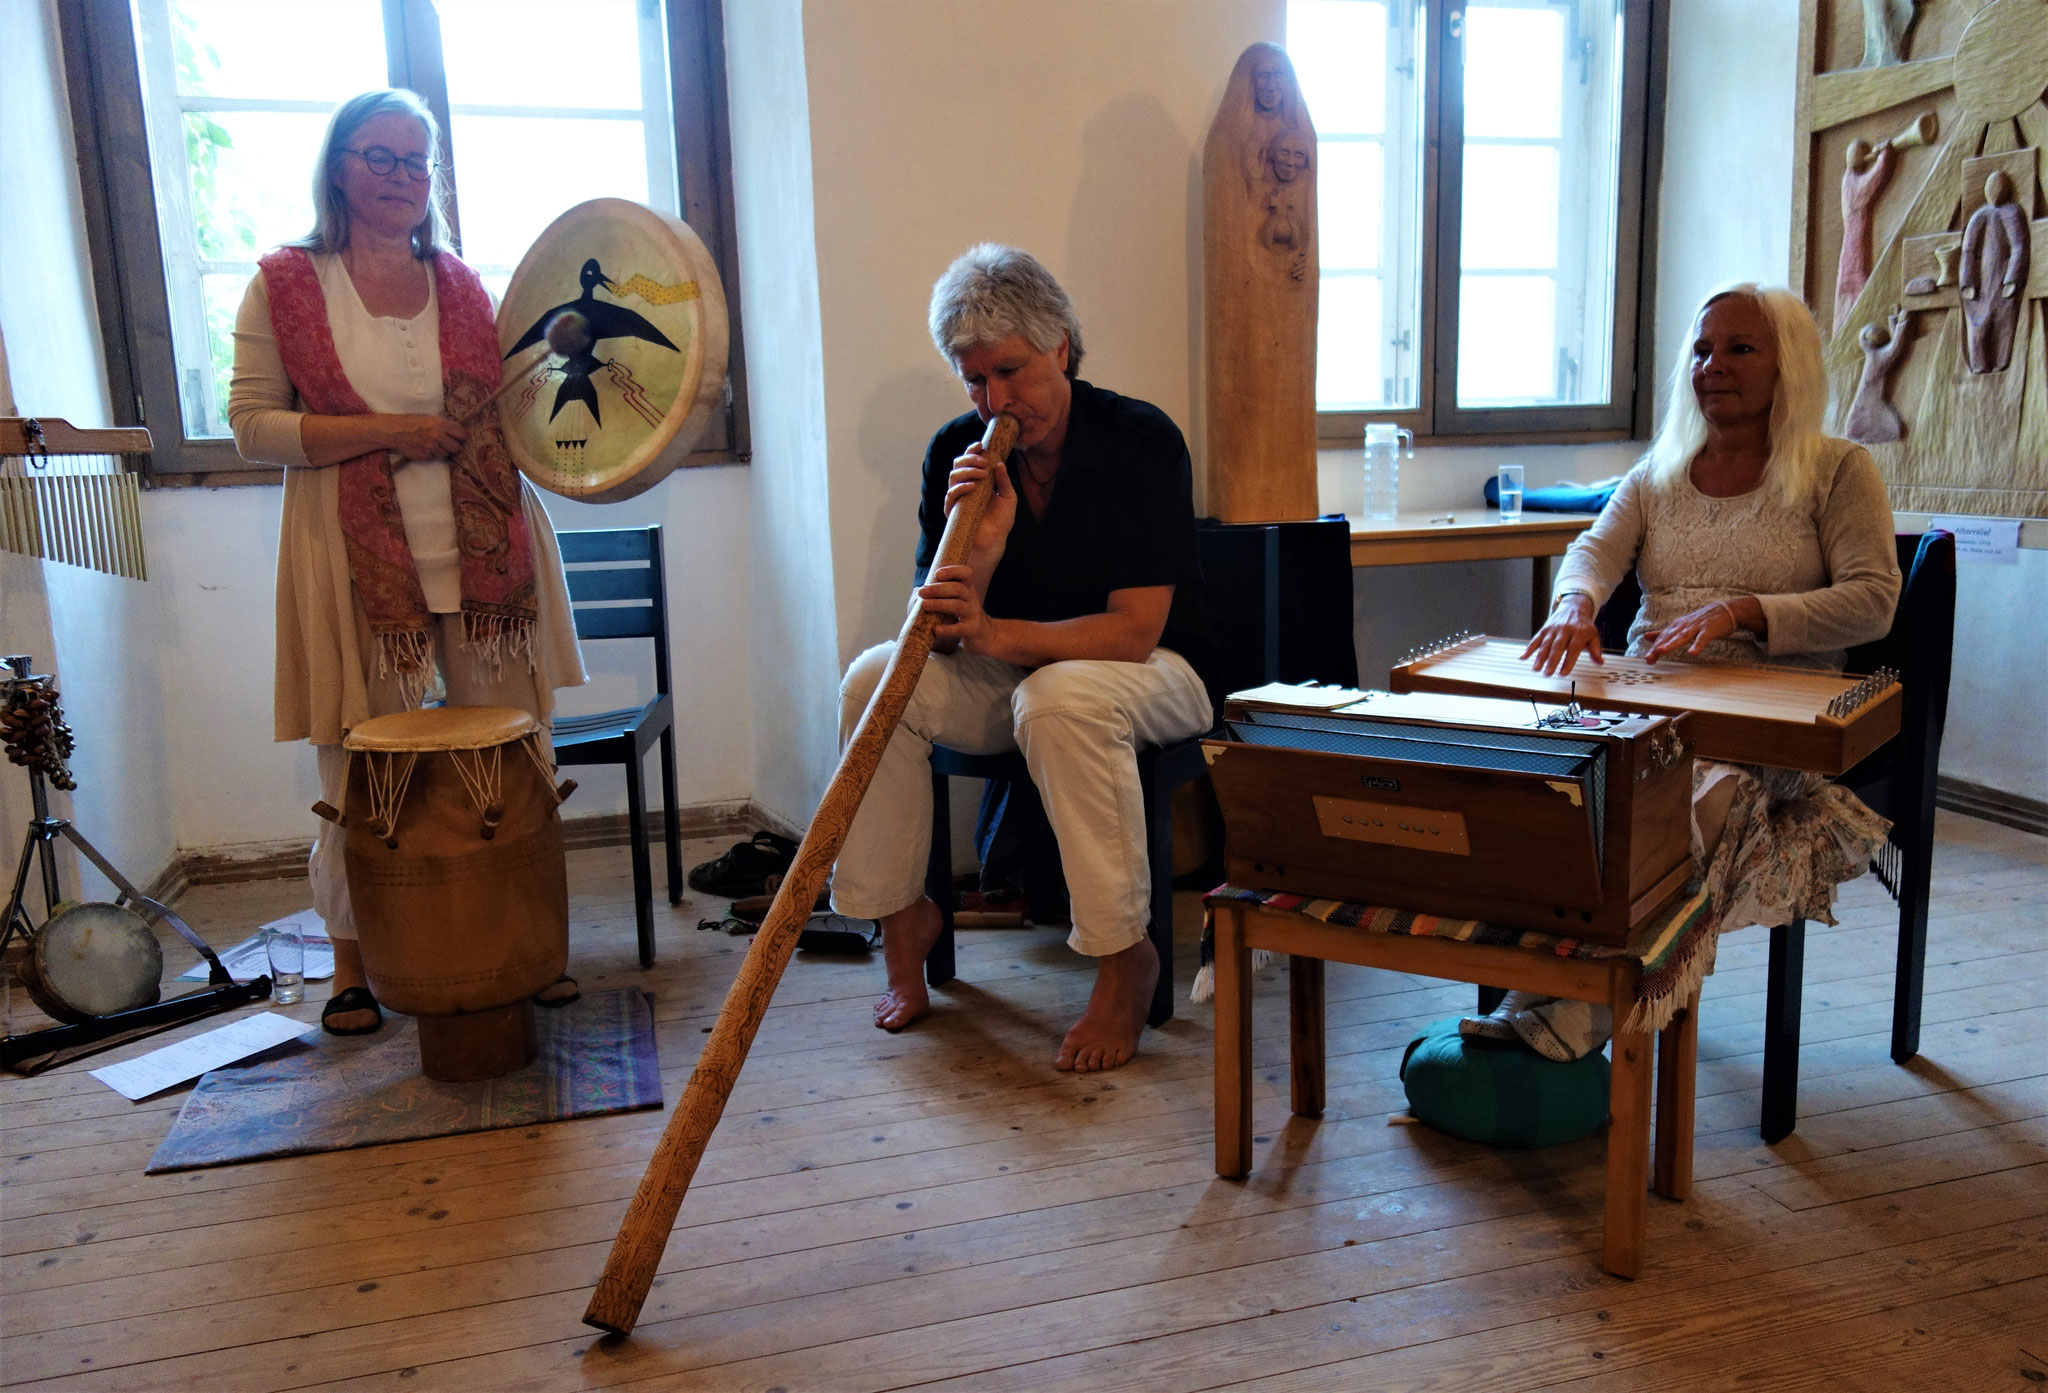 TRIO MUSIKAVIVA: Sophia Becker, Roland Foresta und Ursula Shalina Kanitz. Foto: Jennifer Peppler